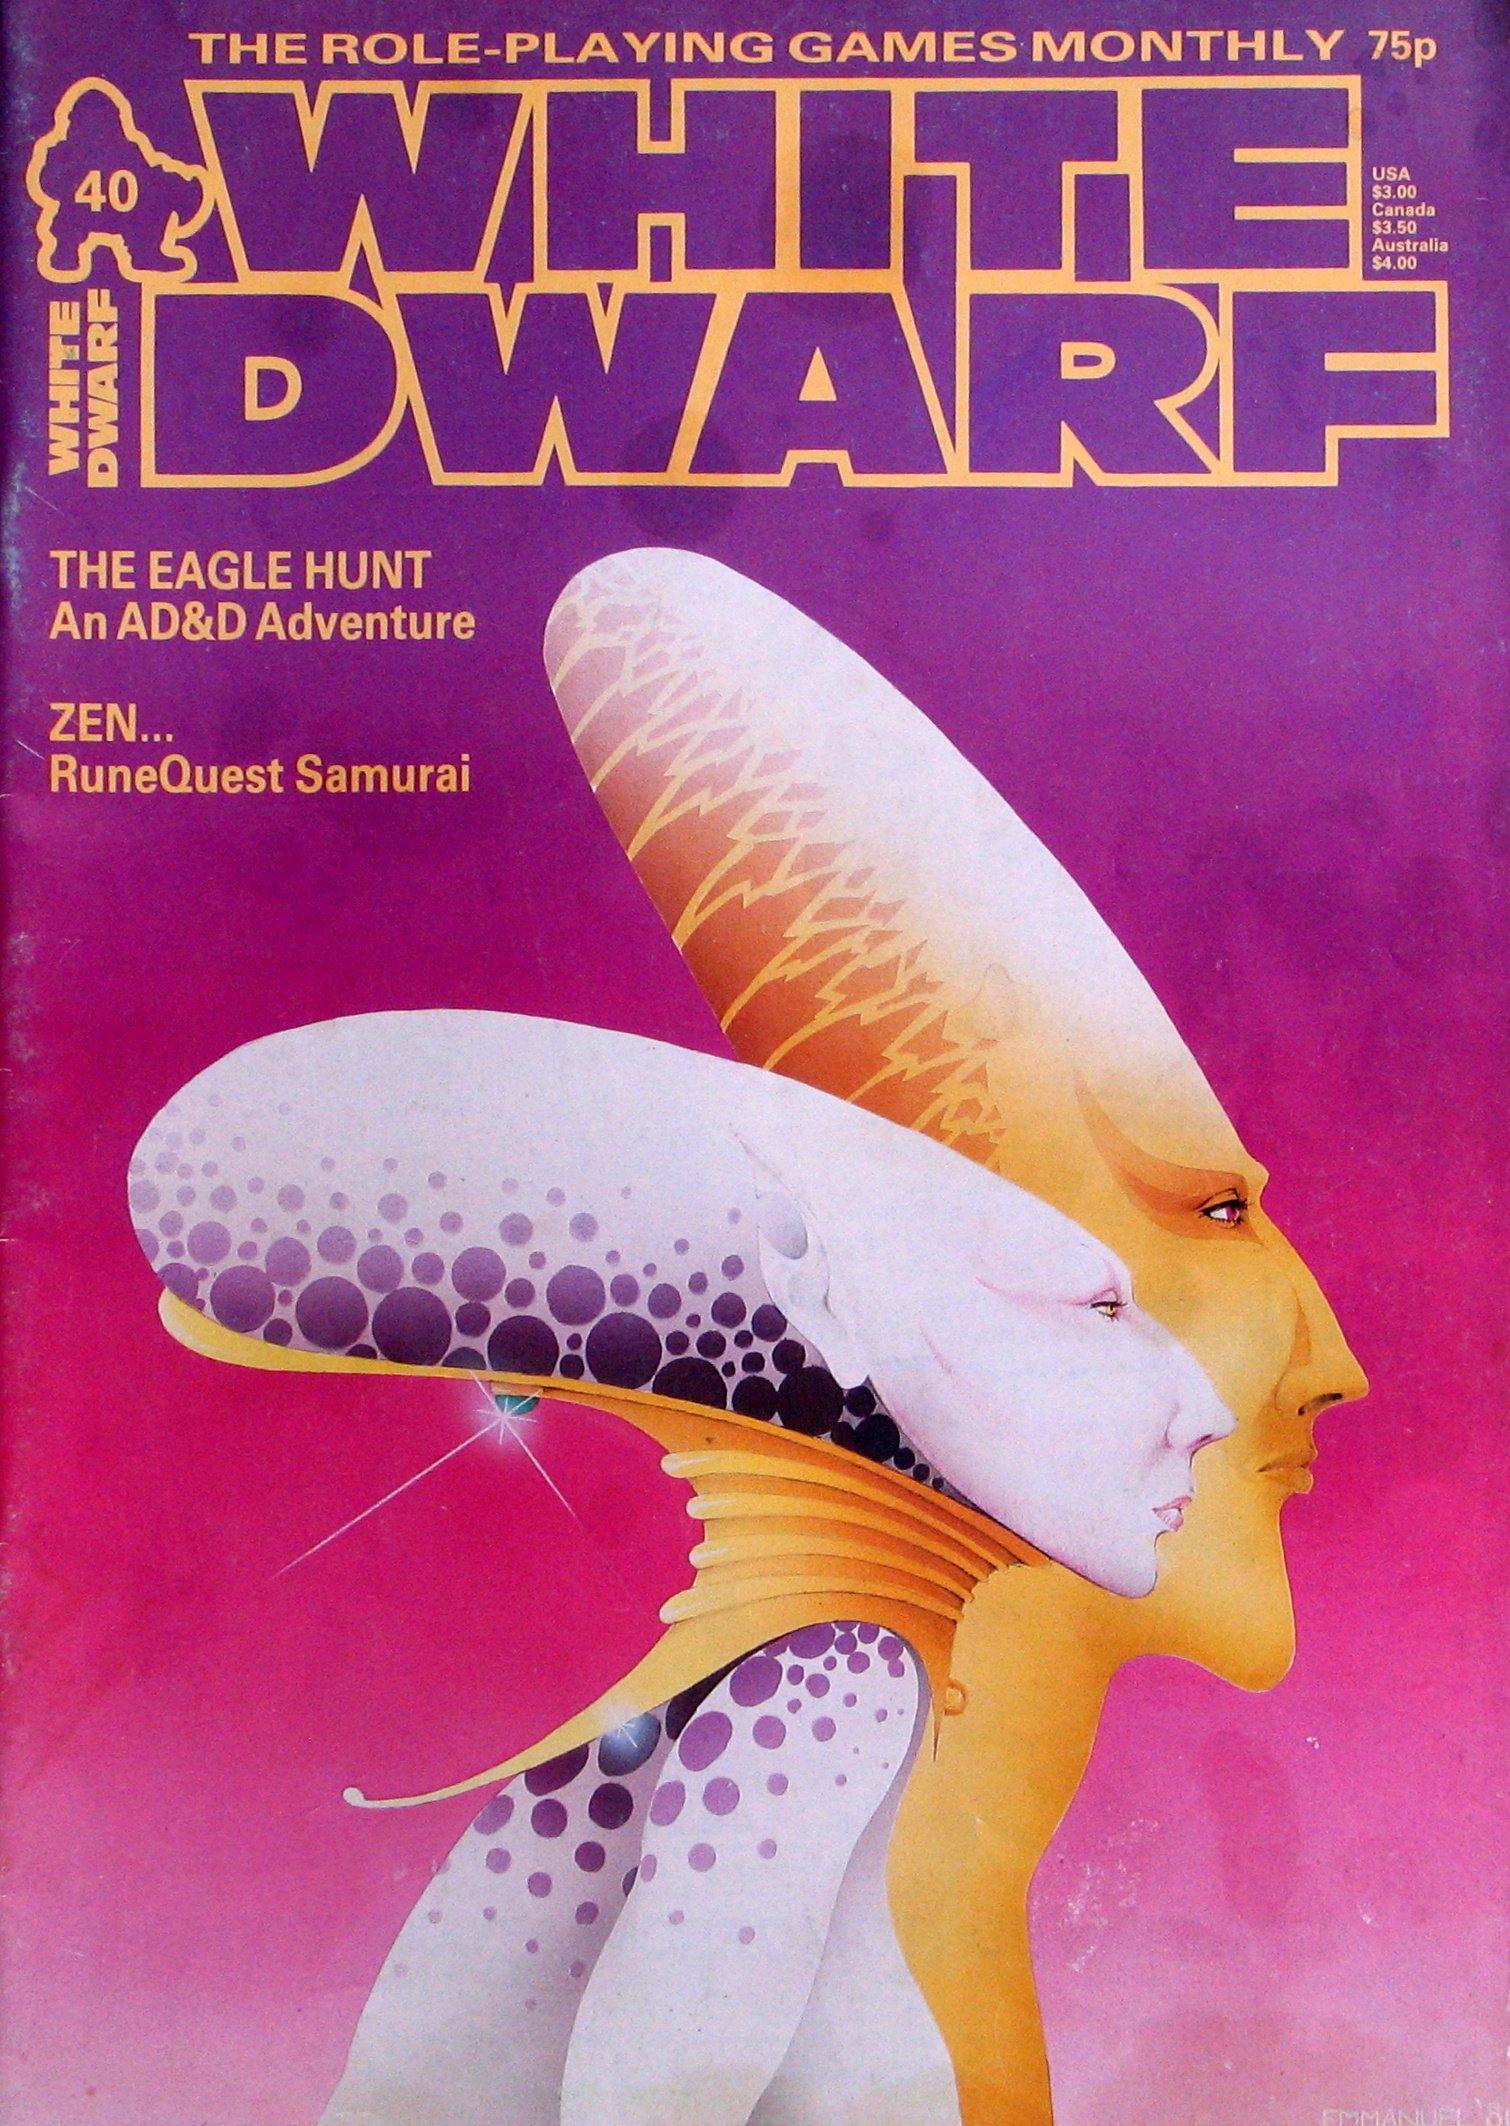 White Dwarf Magazine, Issue 40: Amazon.com: Books